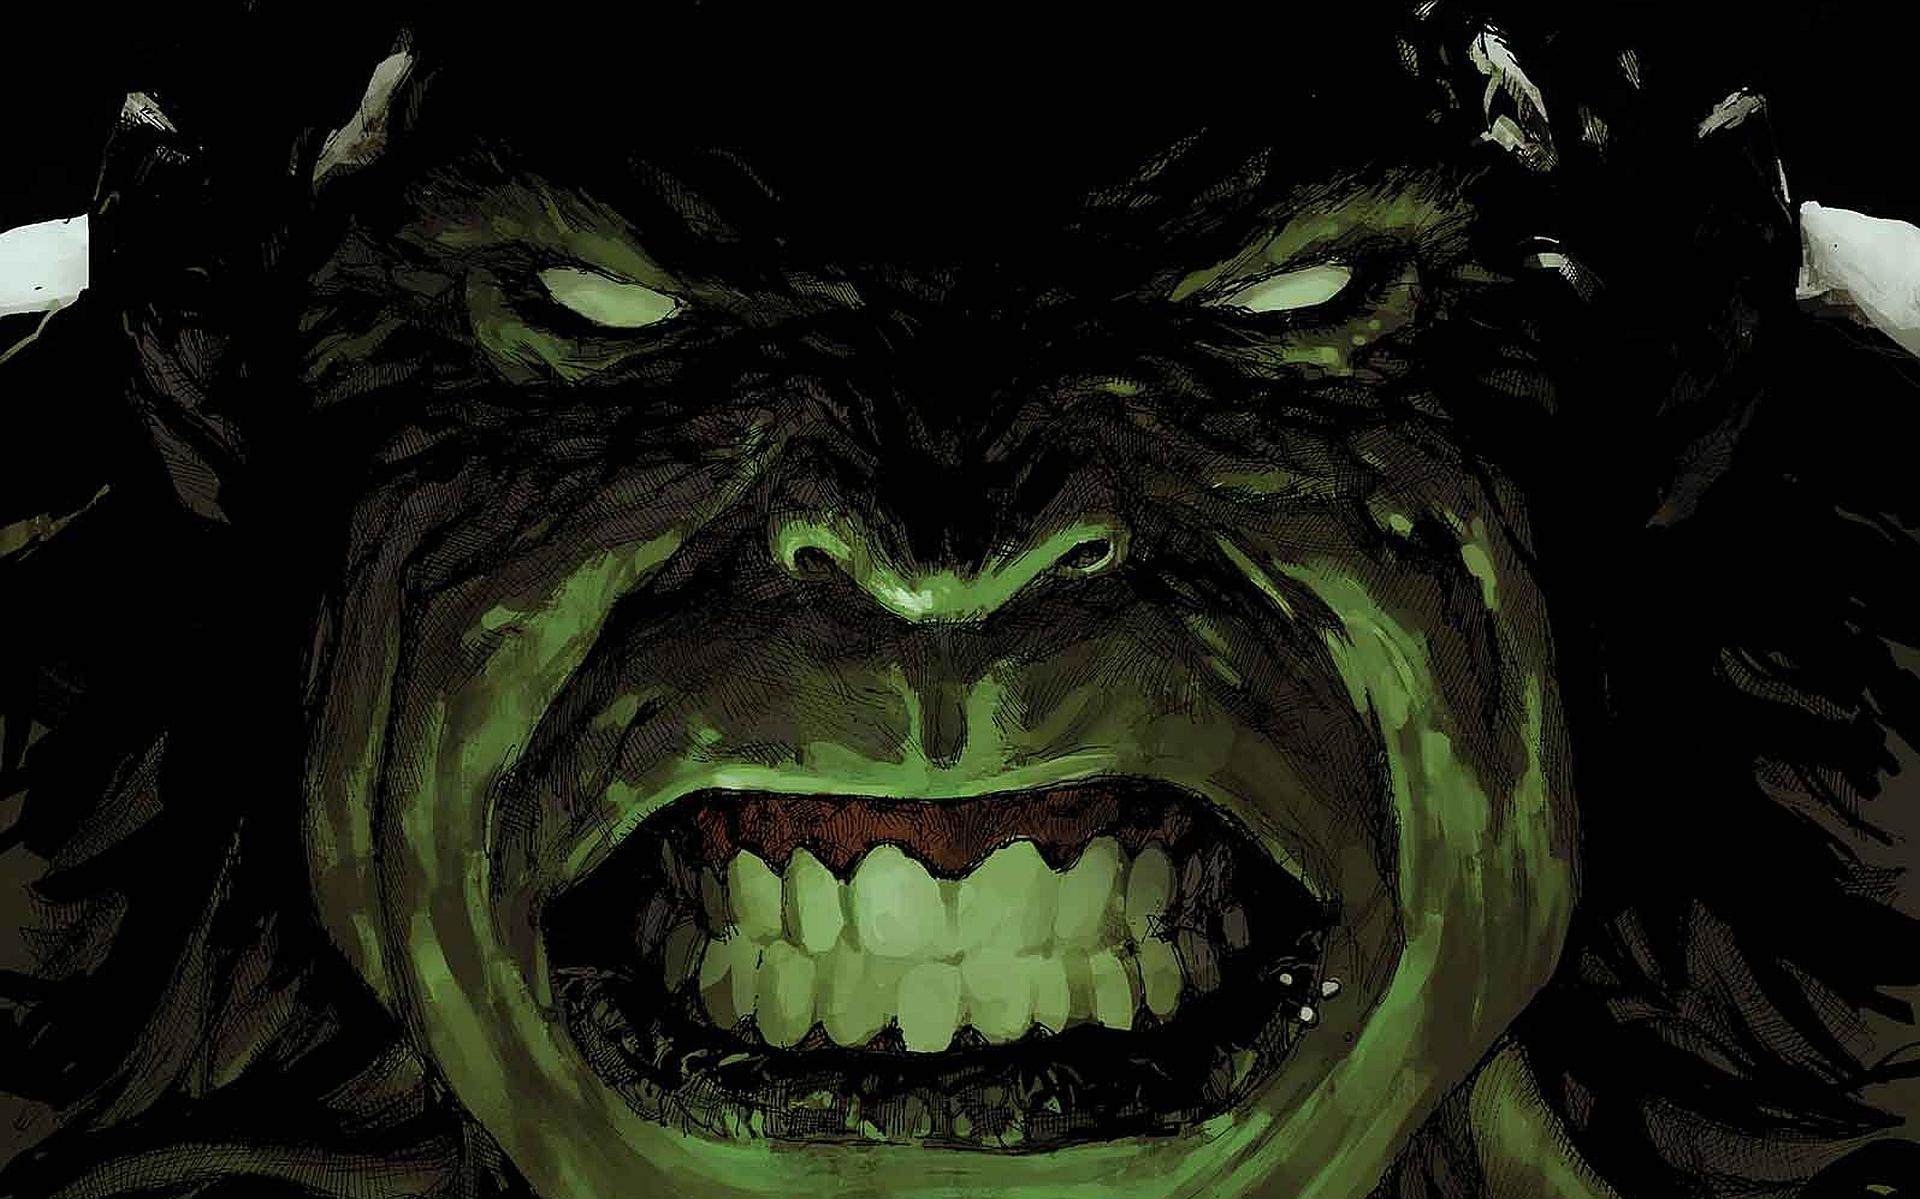 gallery for hulk wallpaper hd 1080p